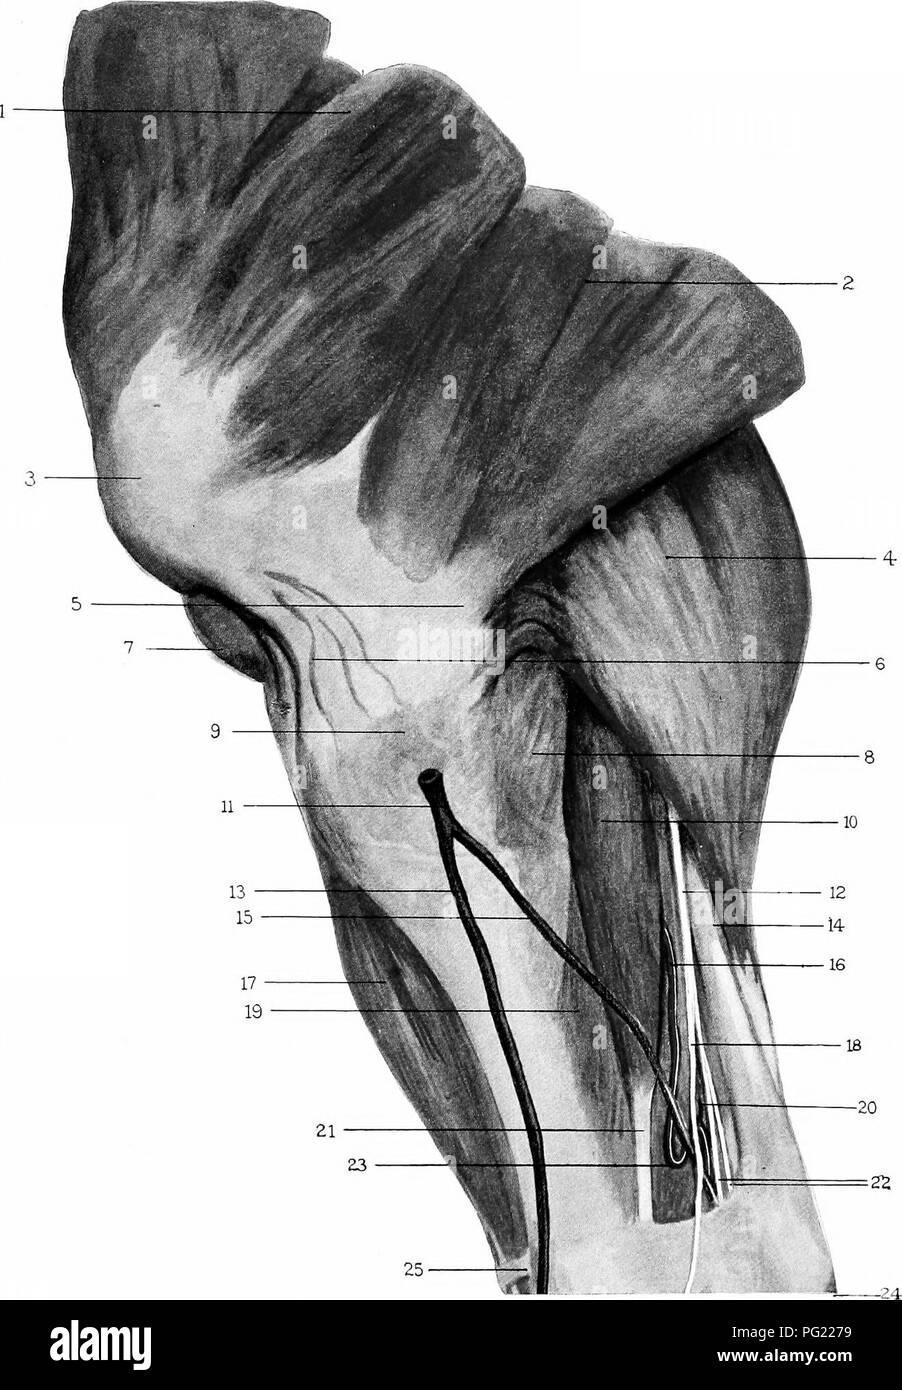 Horse Anatomy Internal Anatomy Horse Stock Photos & Horse Anatomy ...